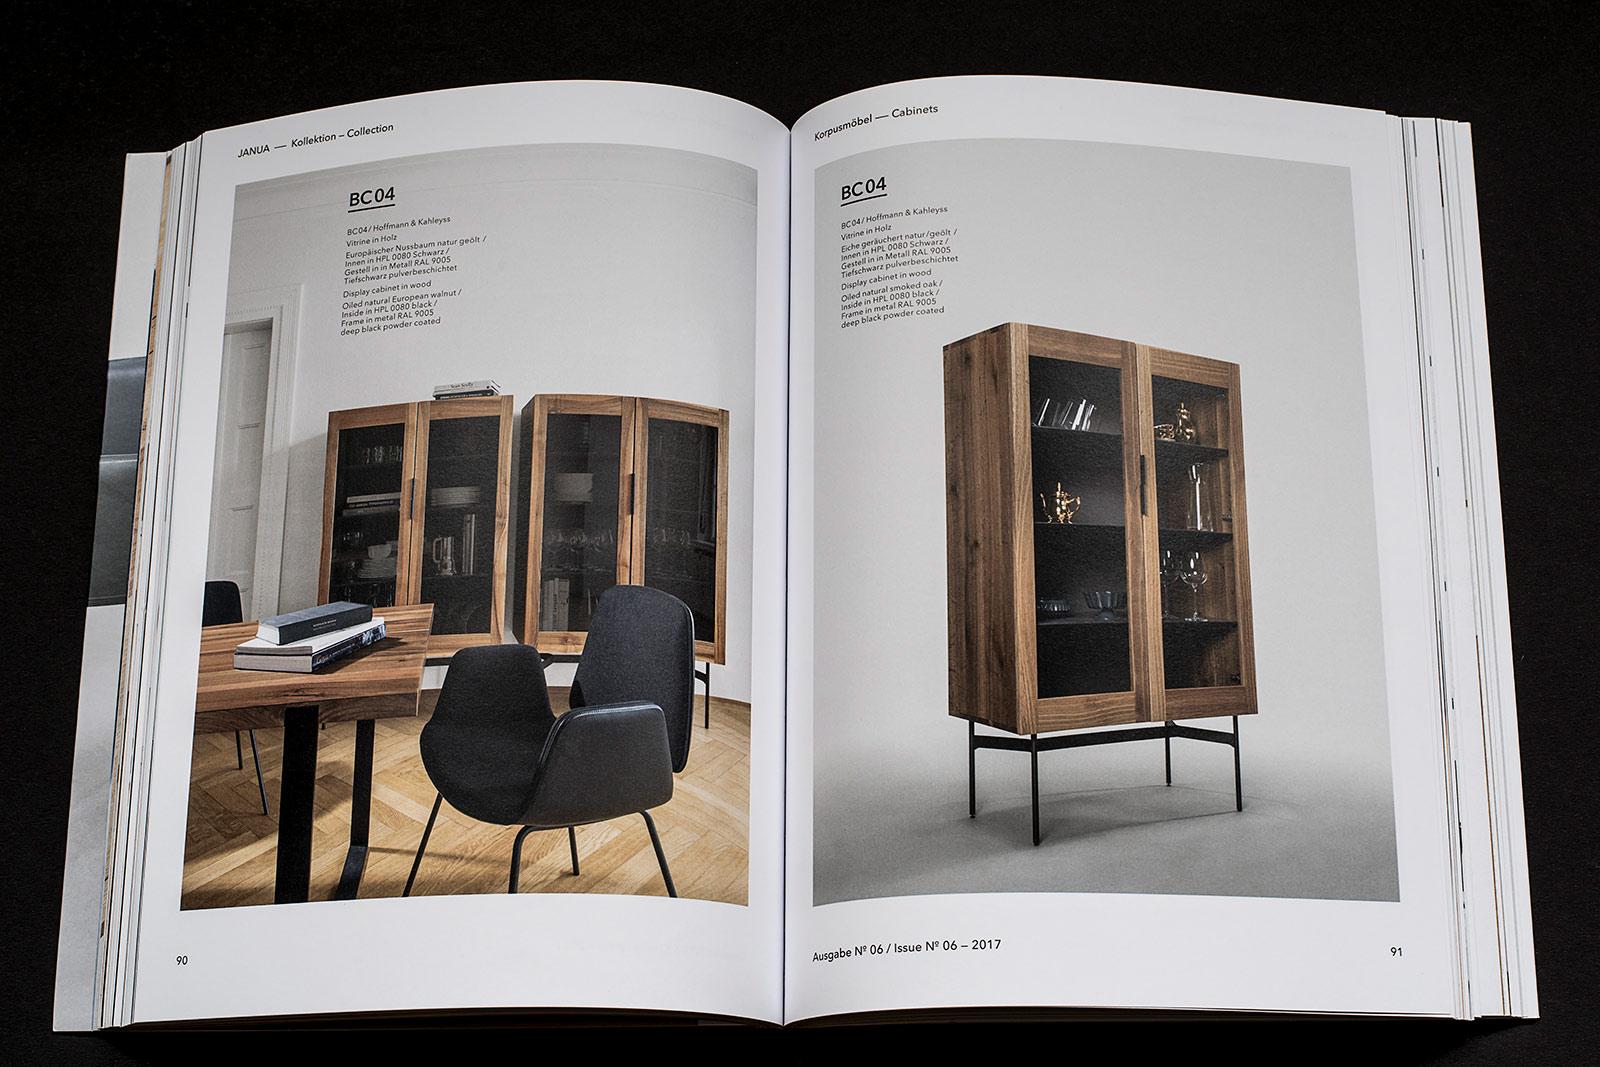 Katalog, Milieu Fotograf, Produktfotografie